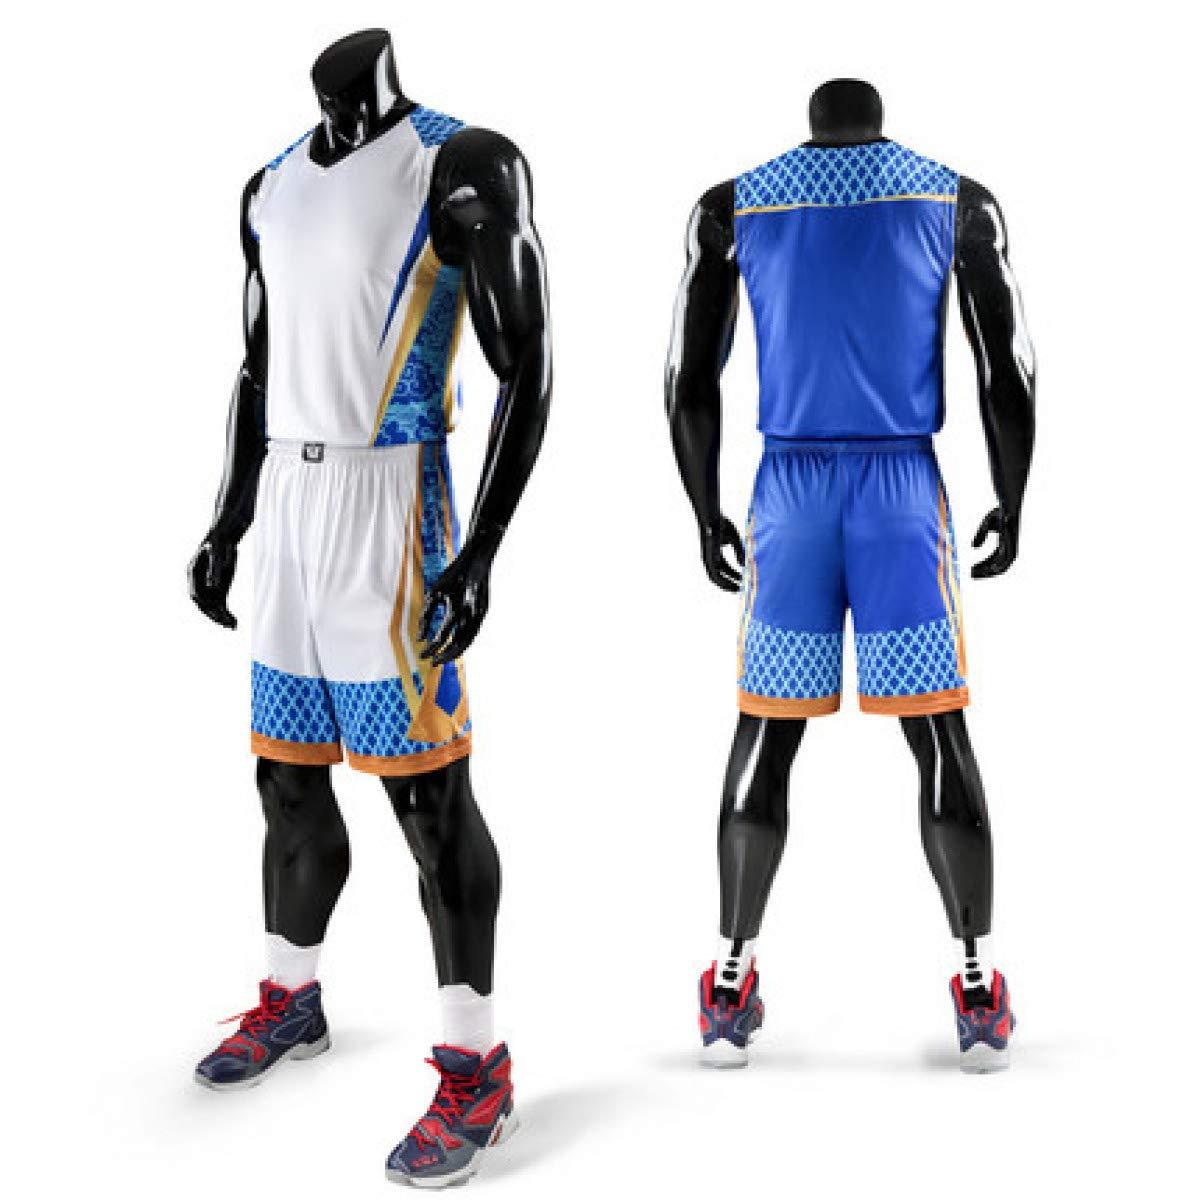 Men Throwback Basketball Training Jersey Set Tracksuits Breathable Basketball